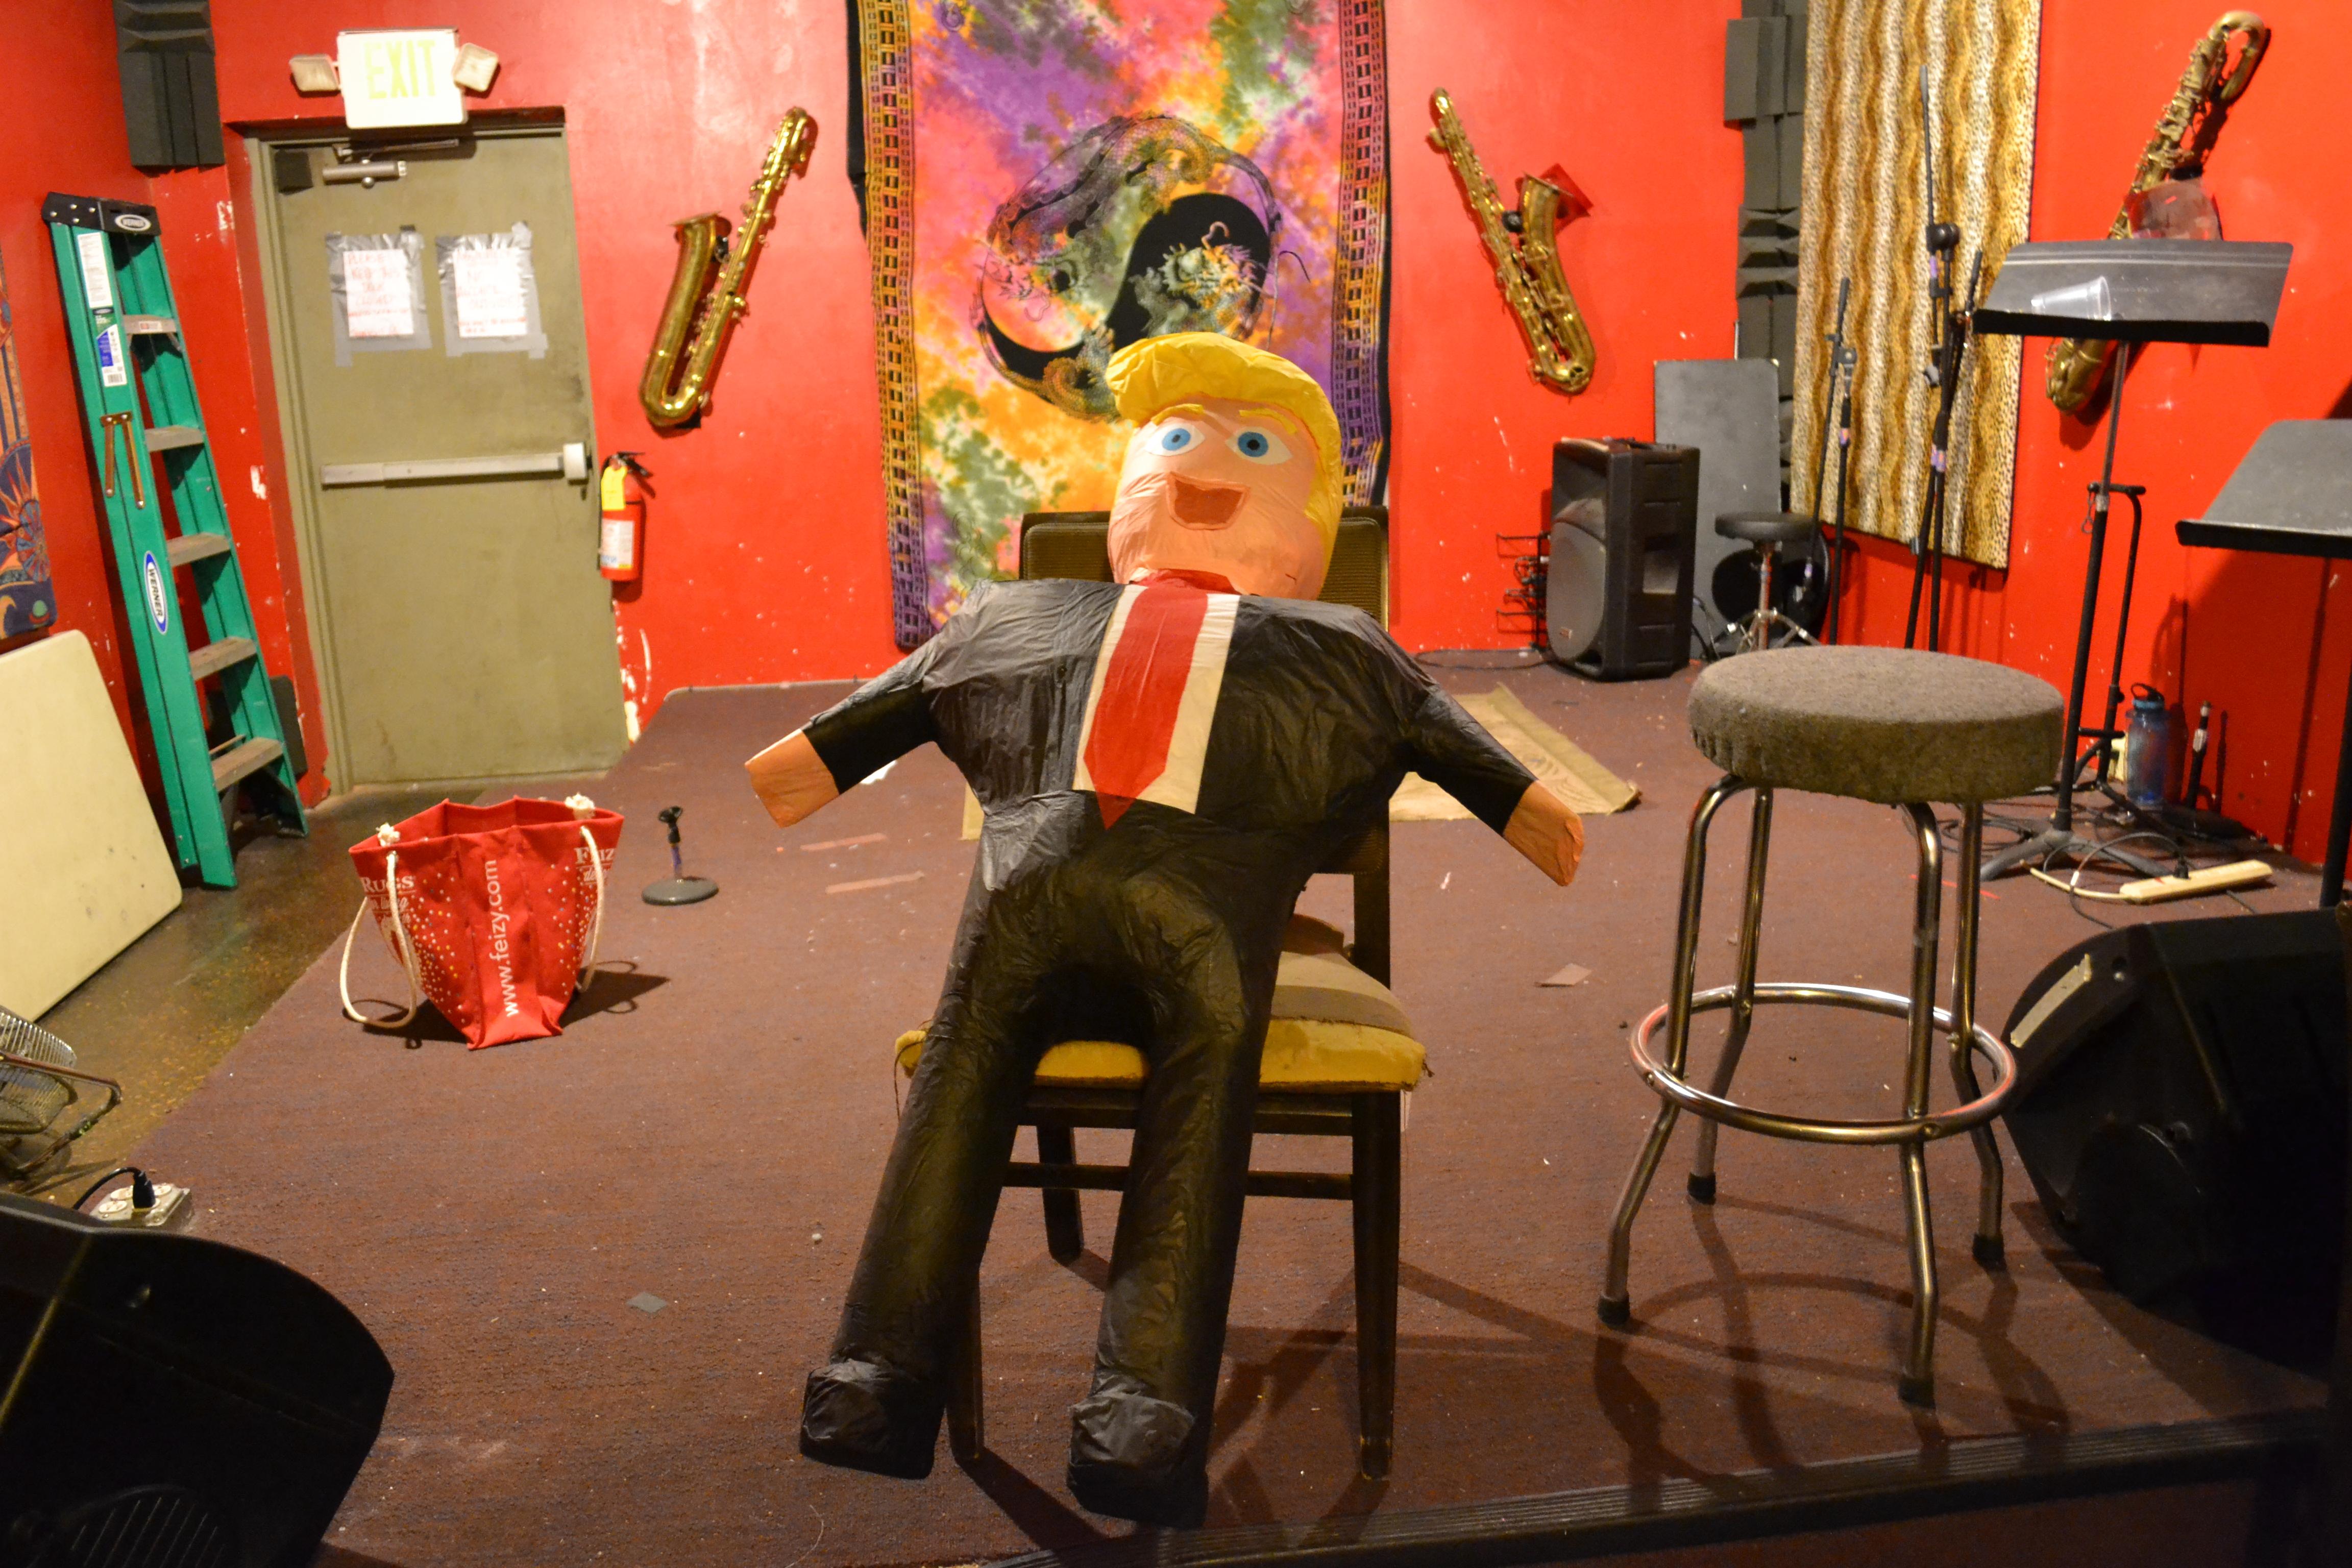 A Donald Trump Pinata awaits as a raffle award at a party for Washington County Democrats, St. George, Utah, Nov. 8, 2016 | Photo by Joseph Witham, St. George News